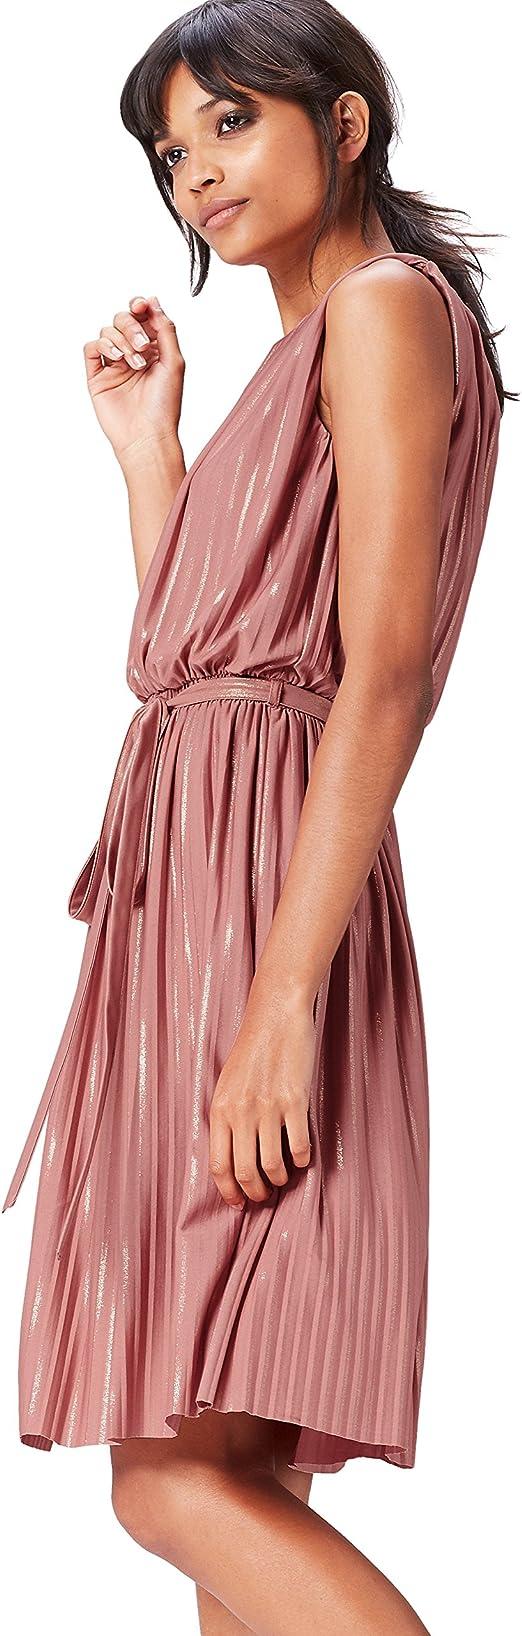 TALLA 46 (Talla del fabricante: XX-Large). Marca Amazon - find. Vestido Plisado de Rayas Metalizadas para Mujer Rosa (Old Rose/Gold) 46 (Talla del fabricante: XX-Large)